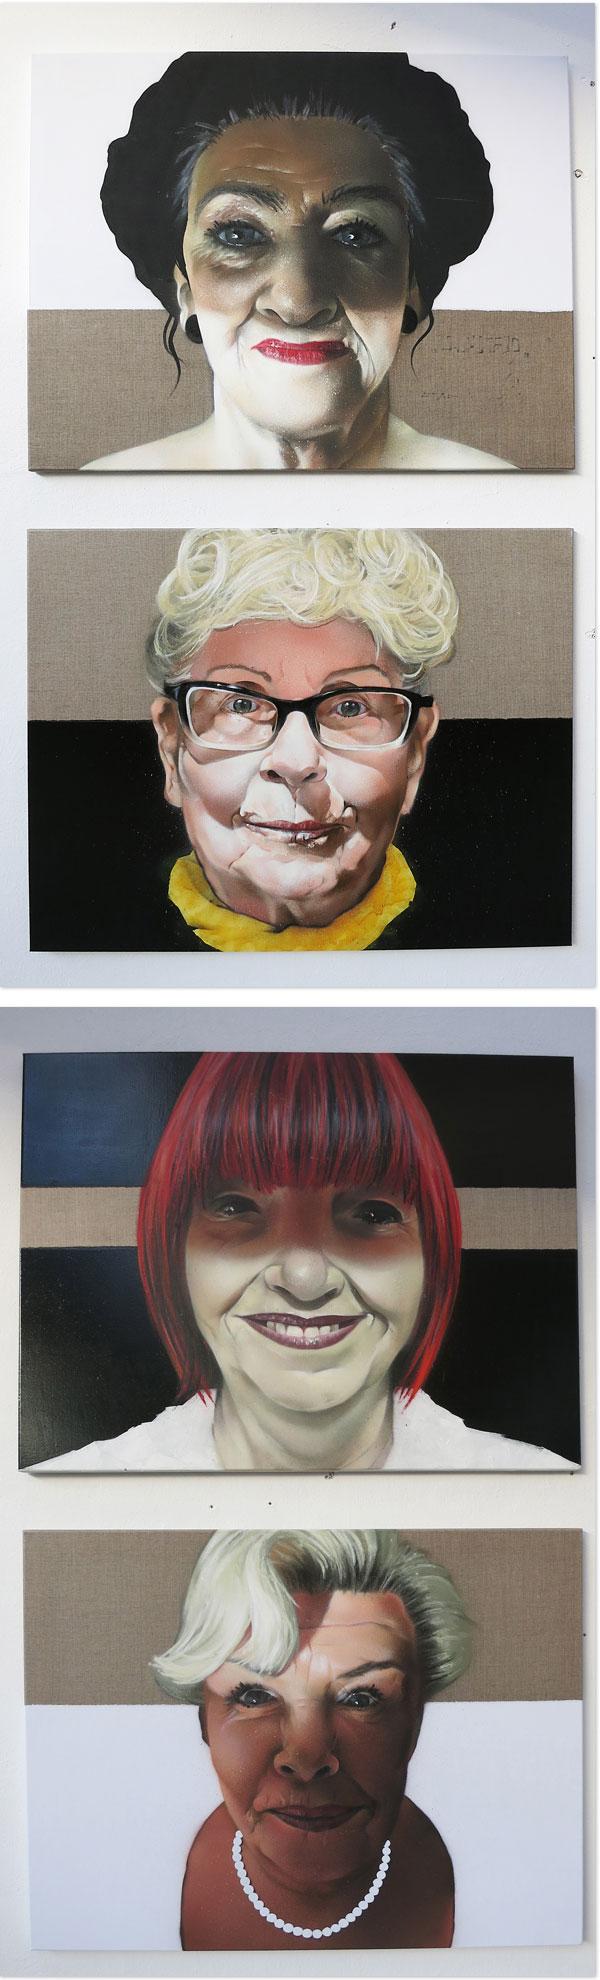 In-Your-Face 2014 |  Kunstausstellung in Augsburg